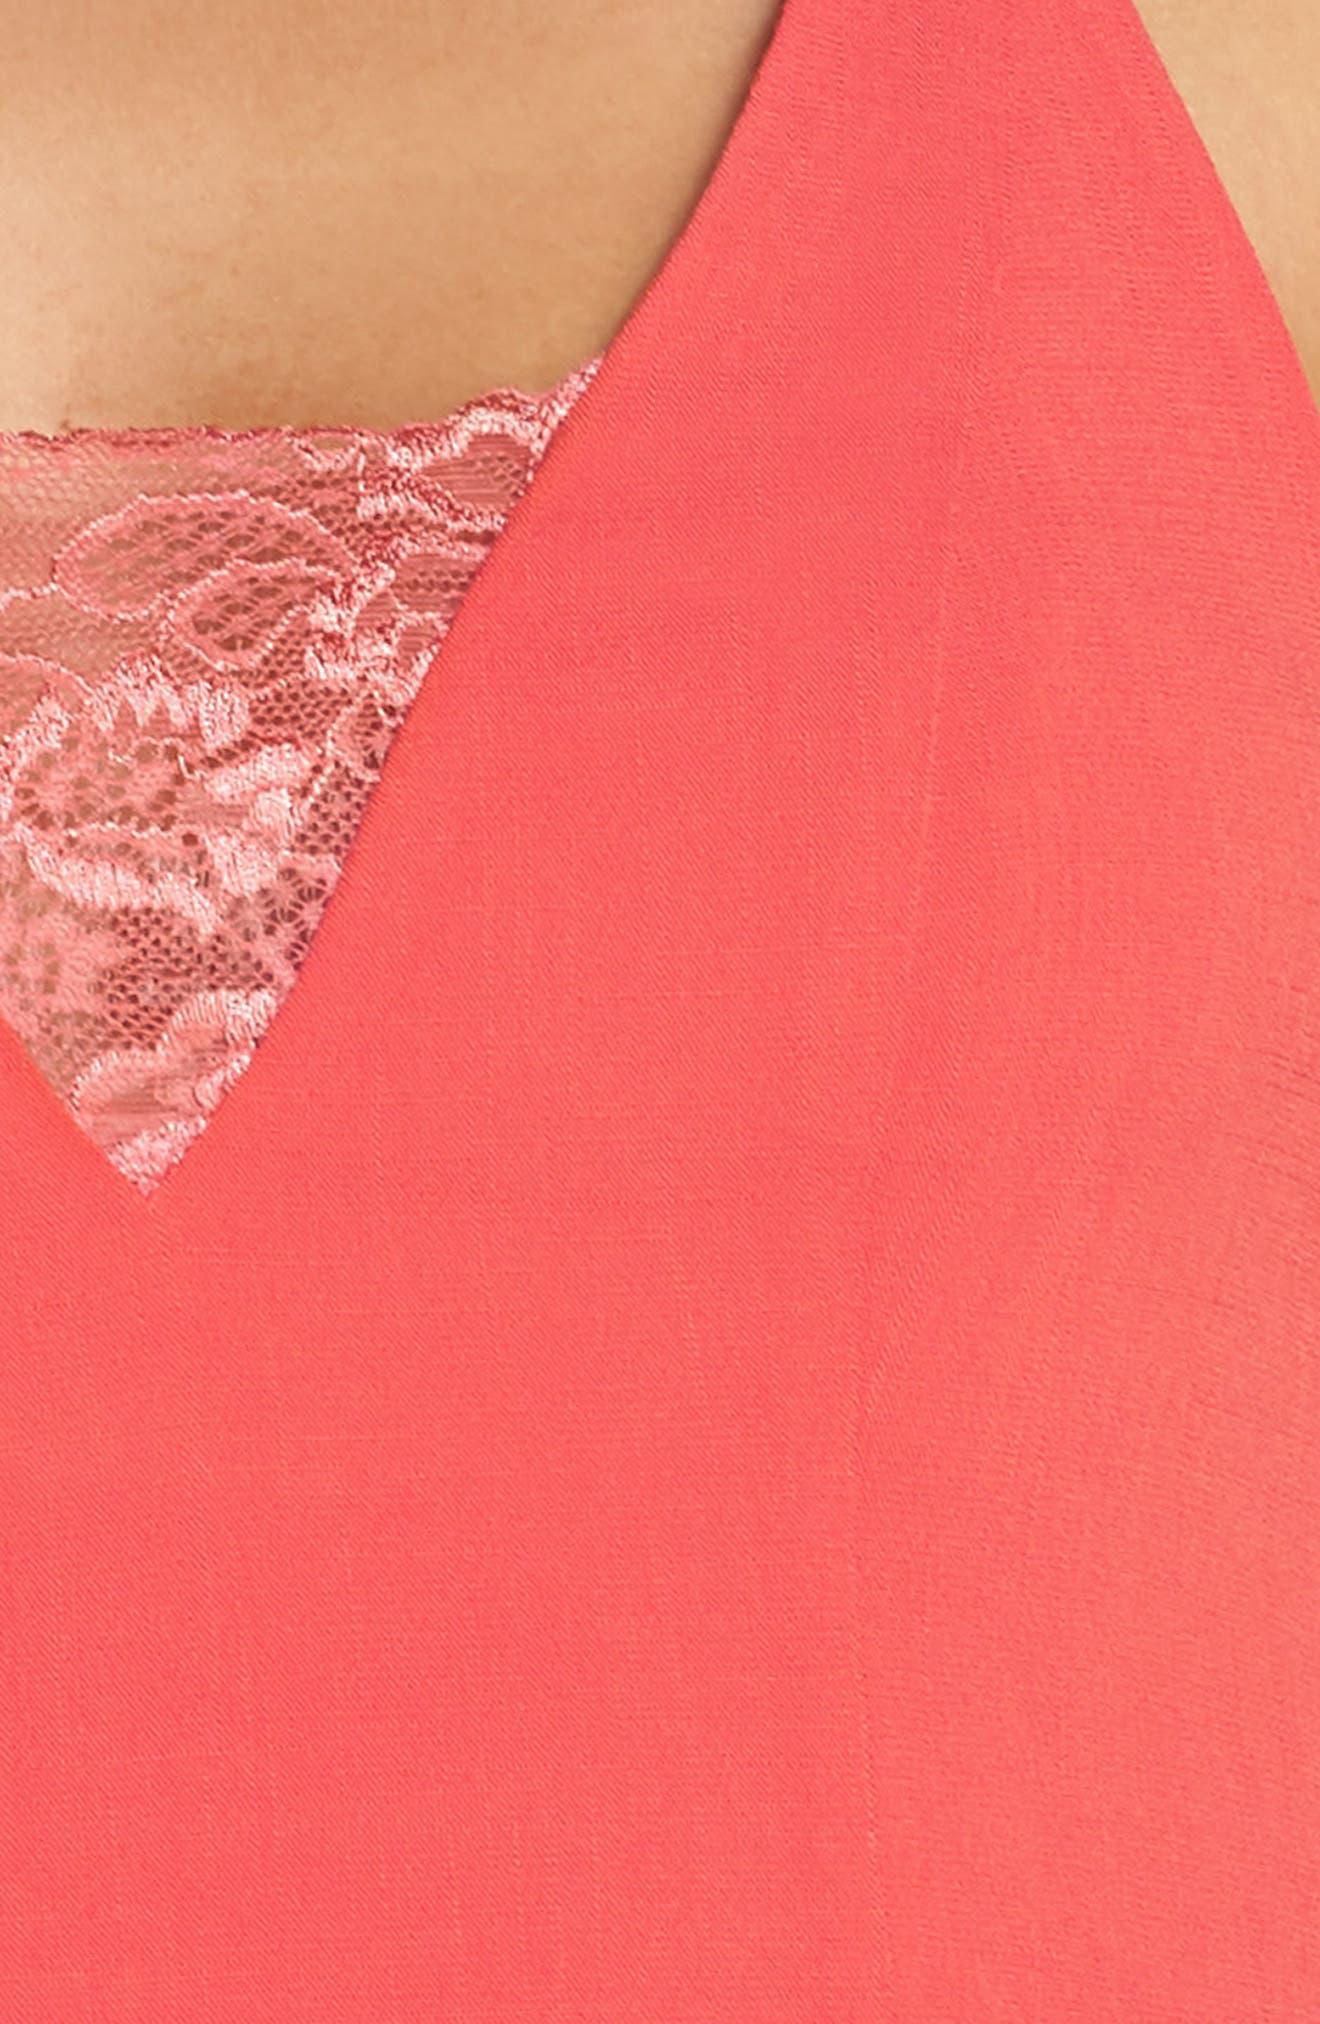 Intimately FP The Century Brami Longline Bralette,                             Alternate thumbnail 12, color,